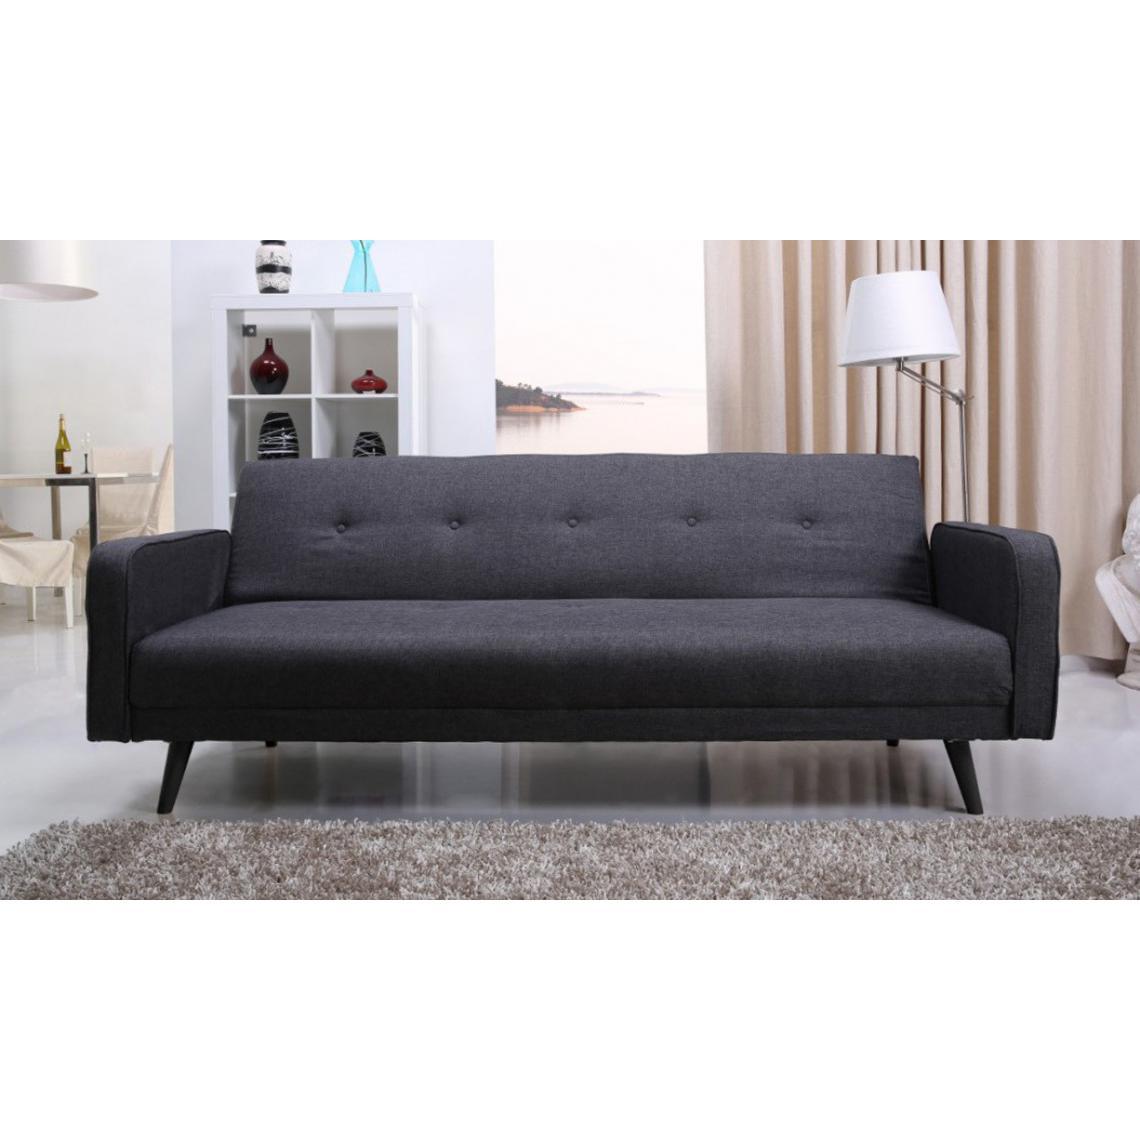 canap convertible en tissu strub 3suisses. Black Bedroom Furniture Sets. Home Design Ideas